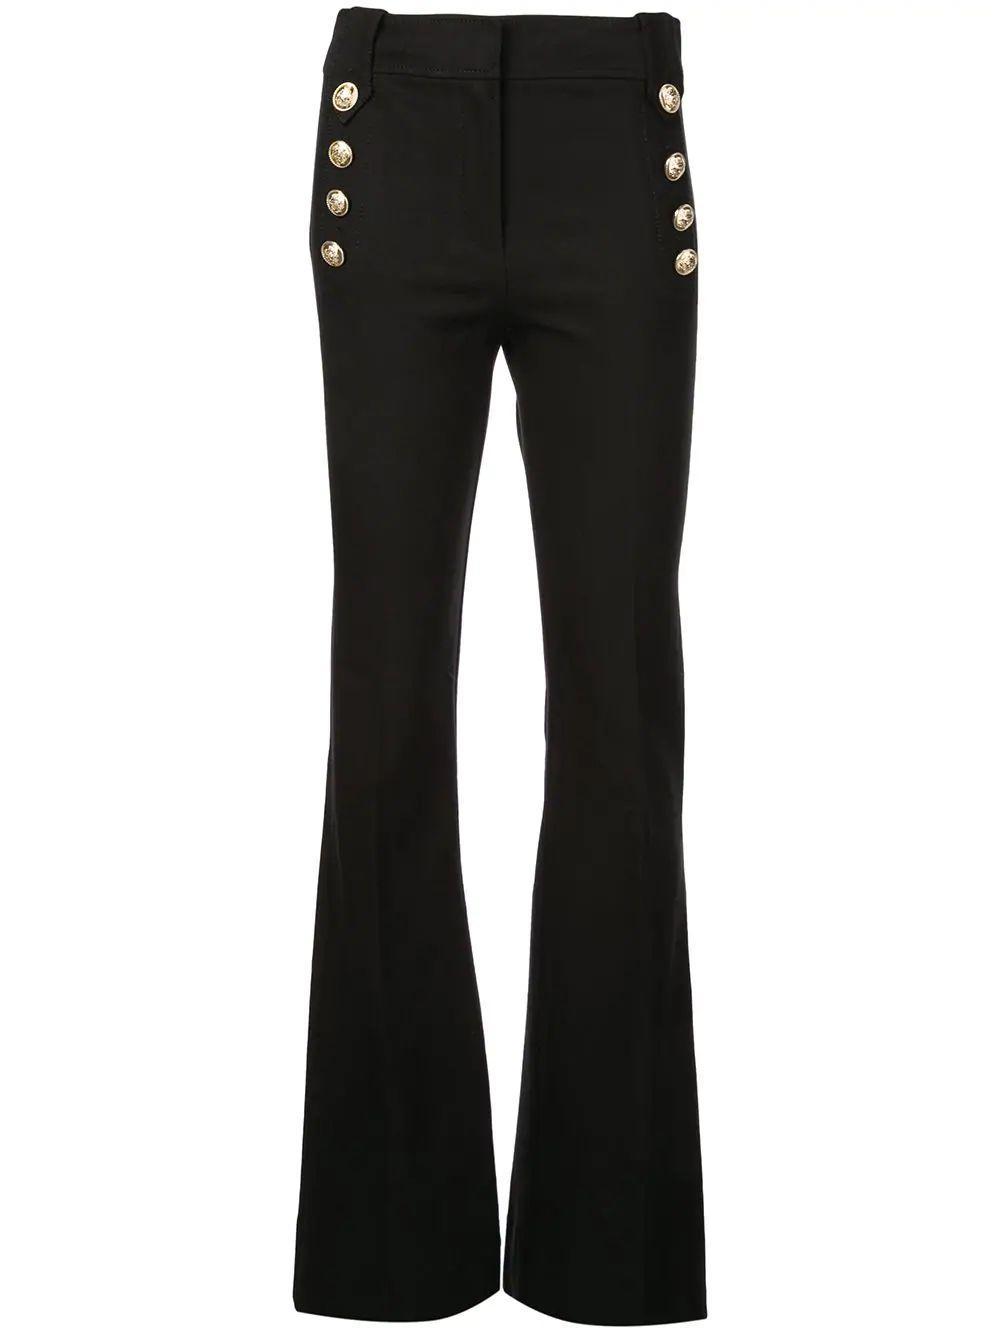 Robertson Flare Trouser Item # TC00100ACR-C